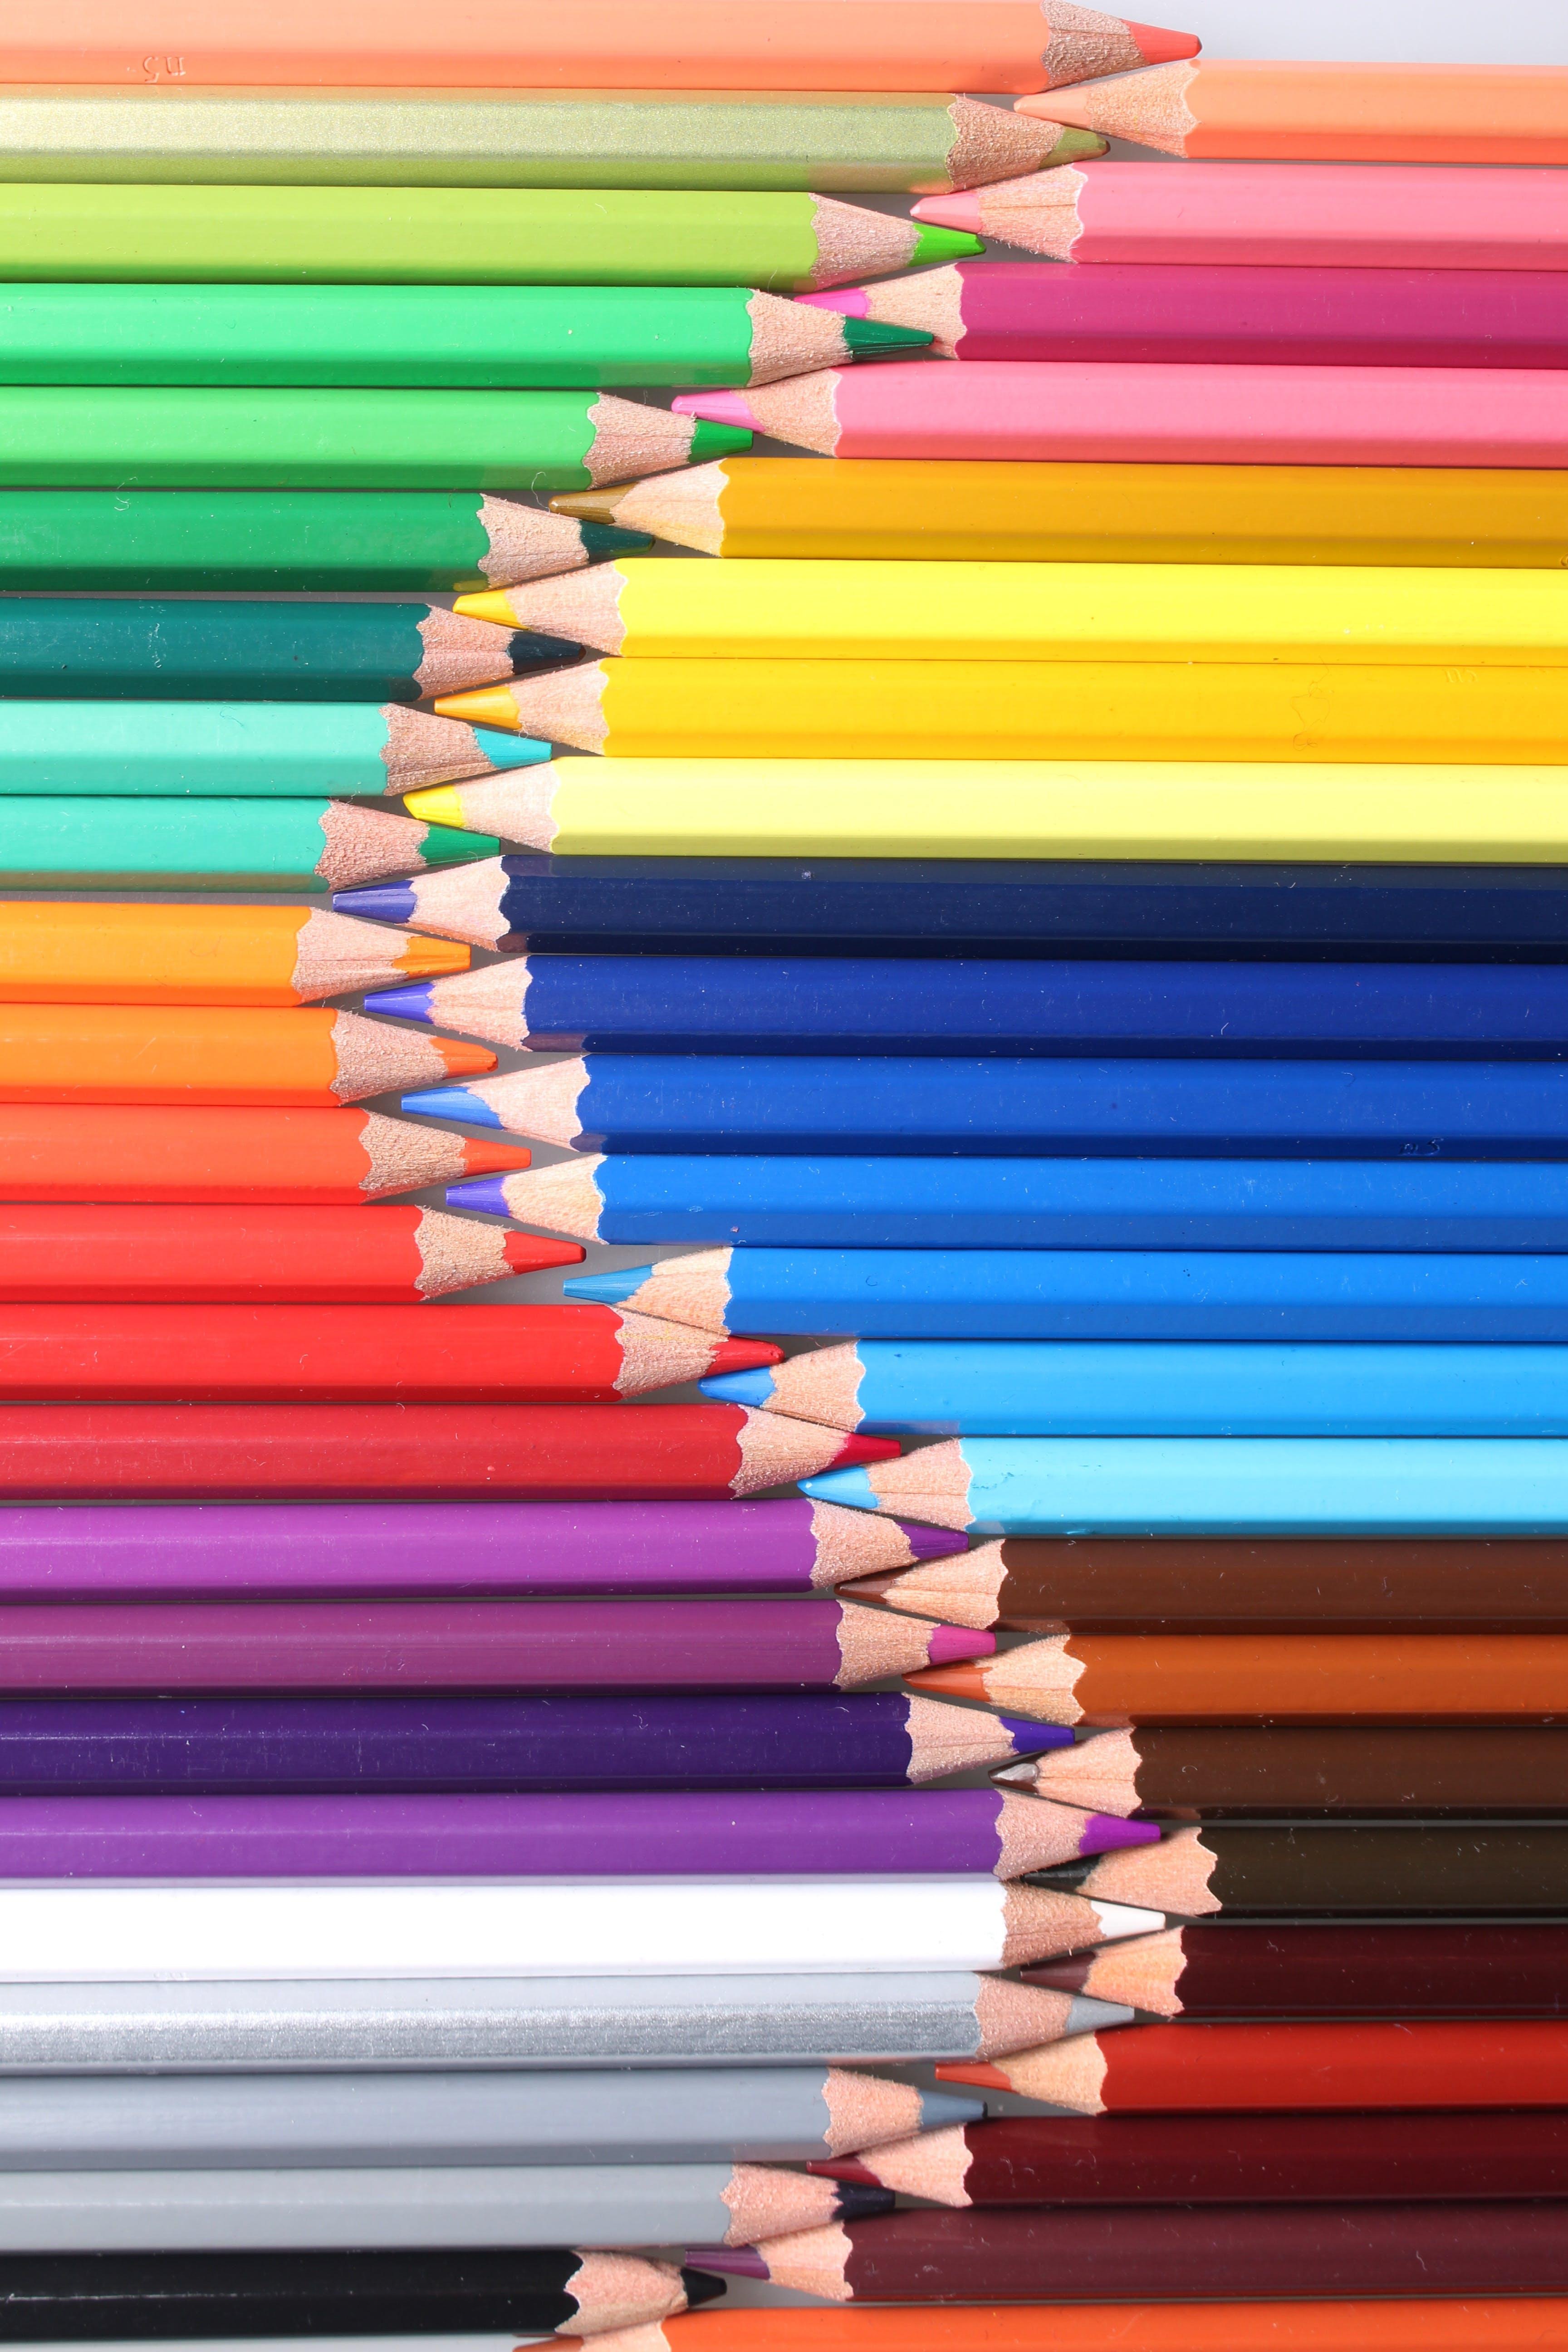 Fotobanka sbezplatnými fotkami na tému farebné ceruzky, farebné ceruzy, farebný, pestrofarebný